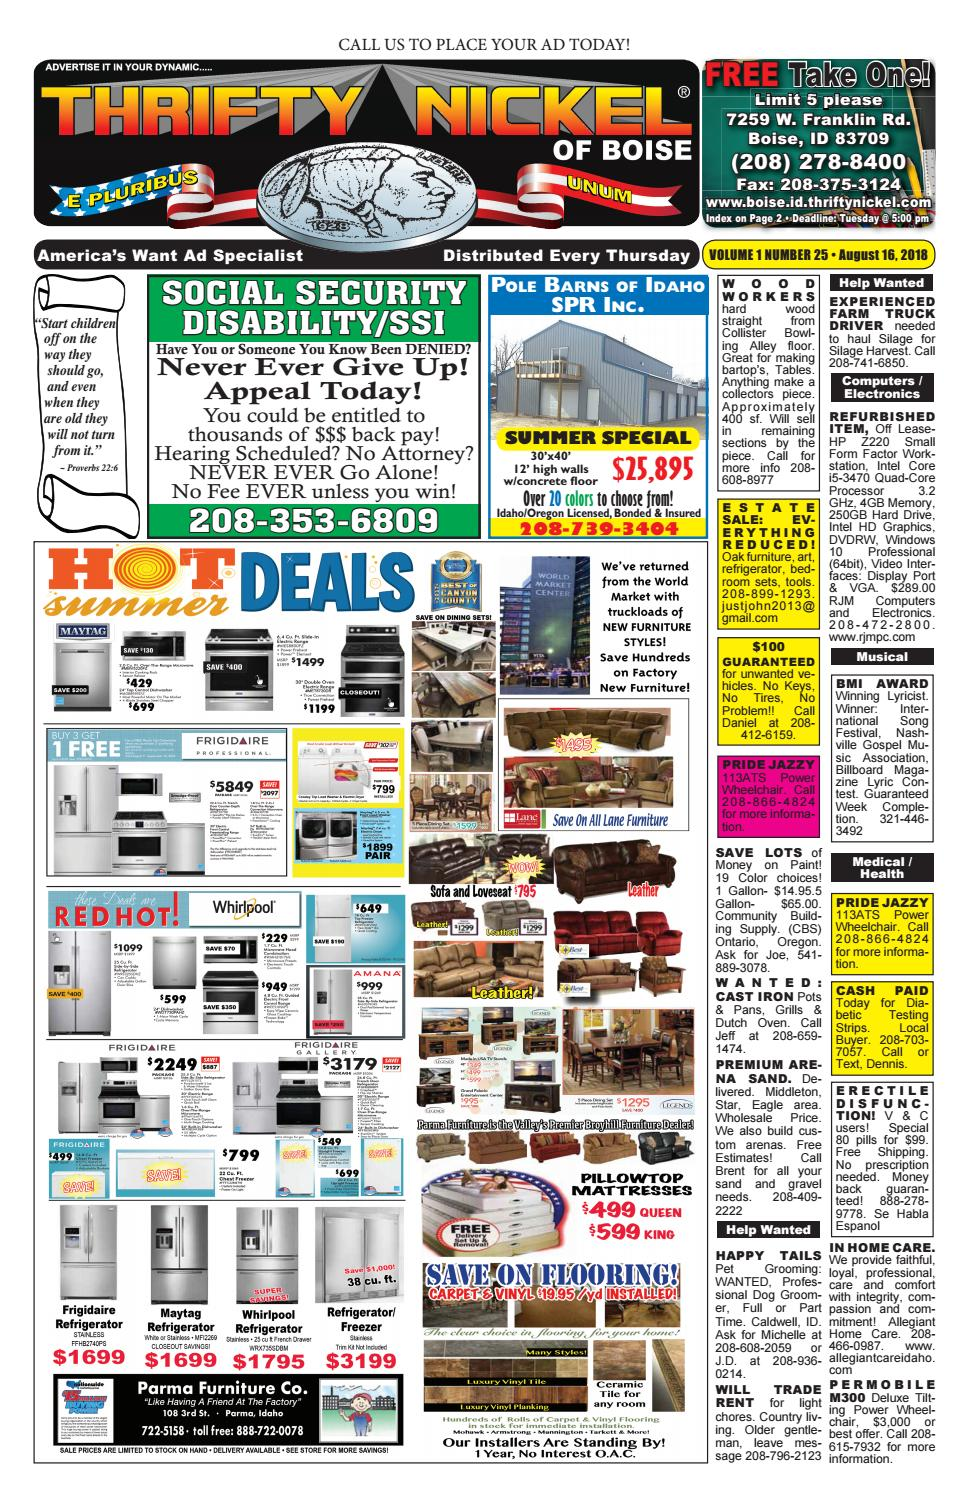 Boise Thrifty Nickel 08/16/18 by tvdist - issuu